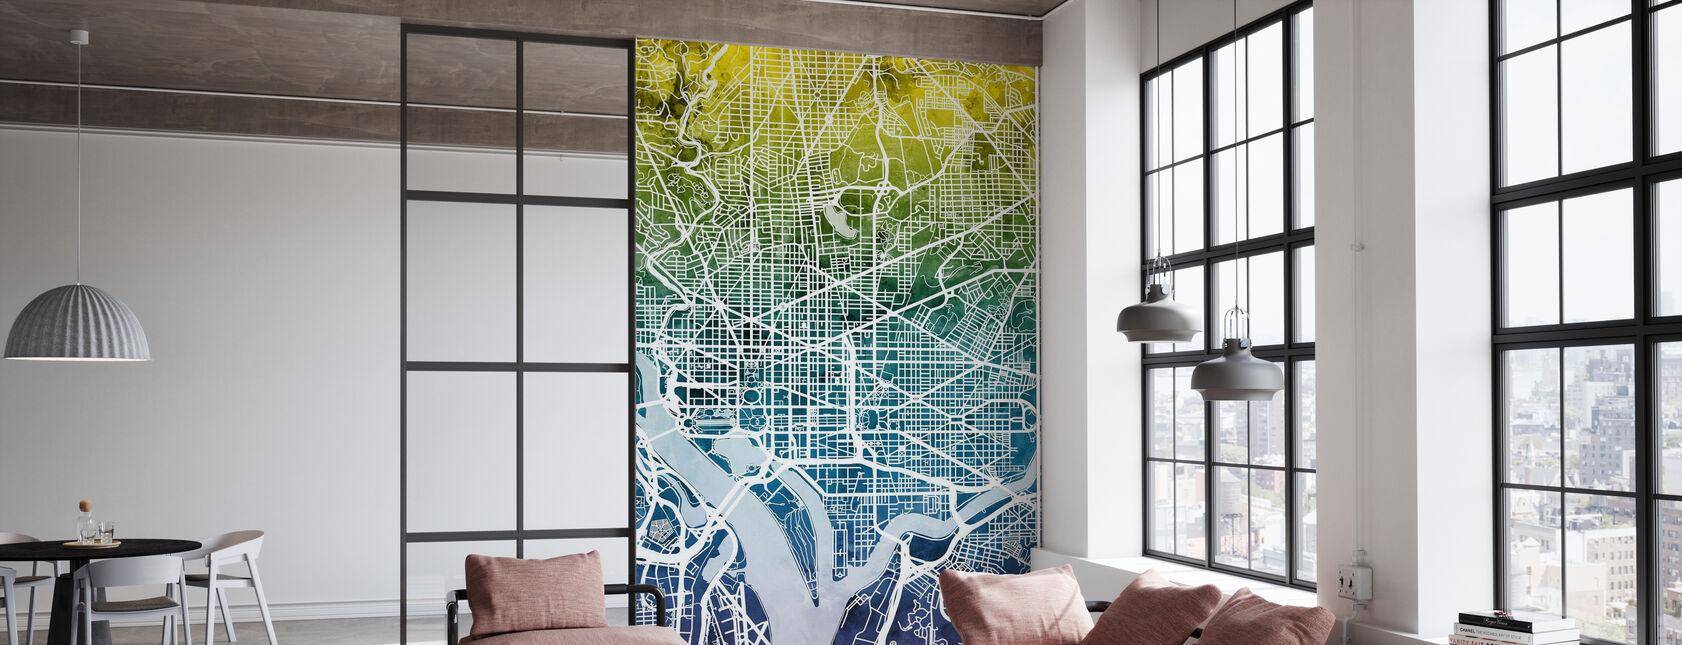 Washington DC Street Map Bluegreen - Wallpaper - Office